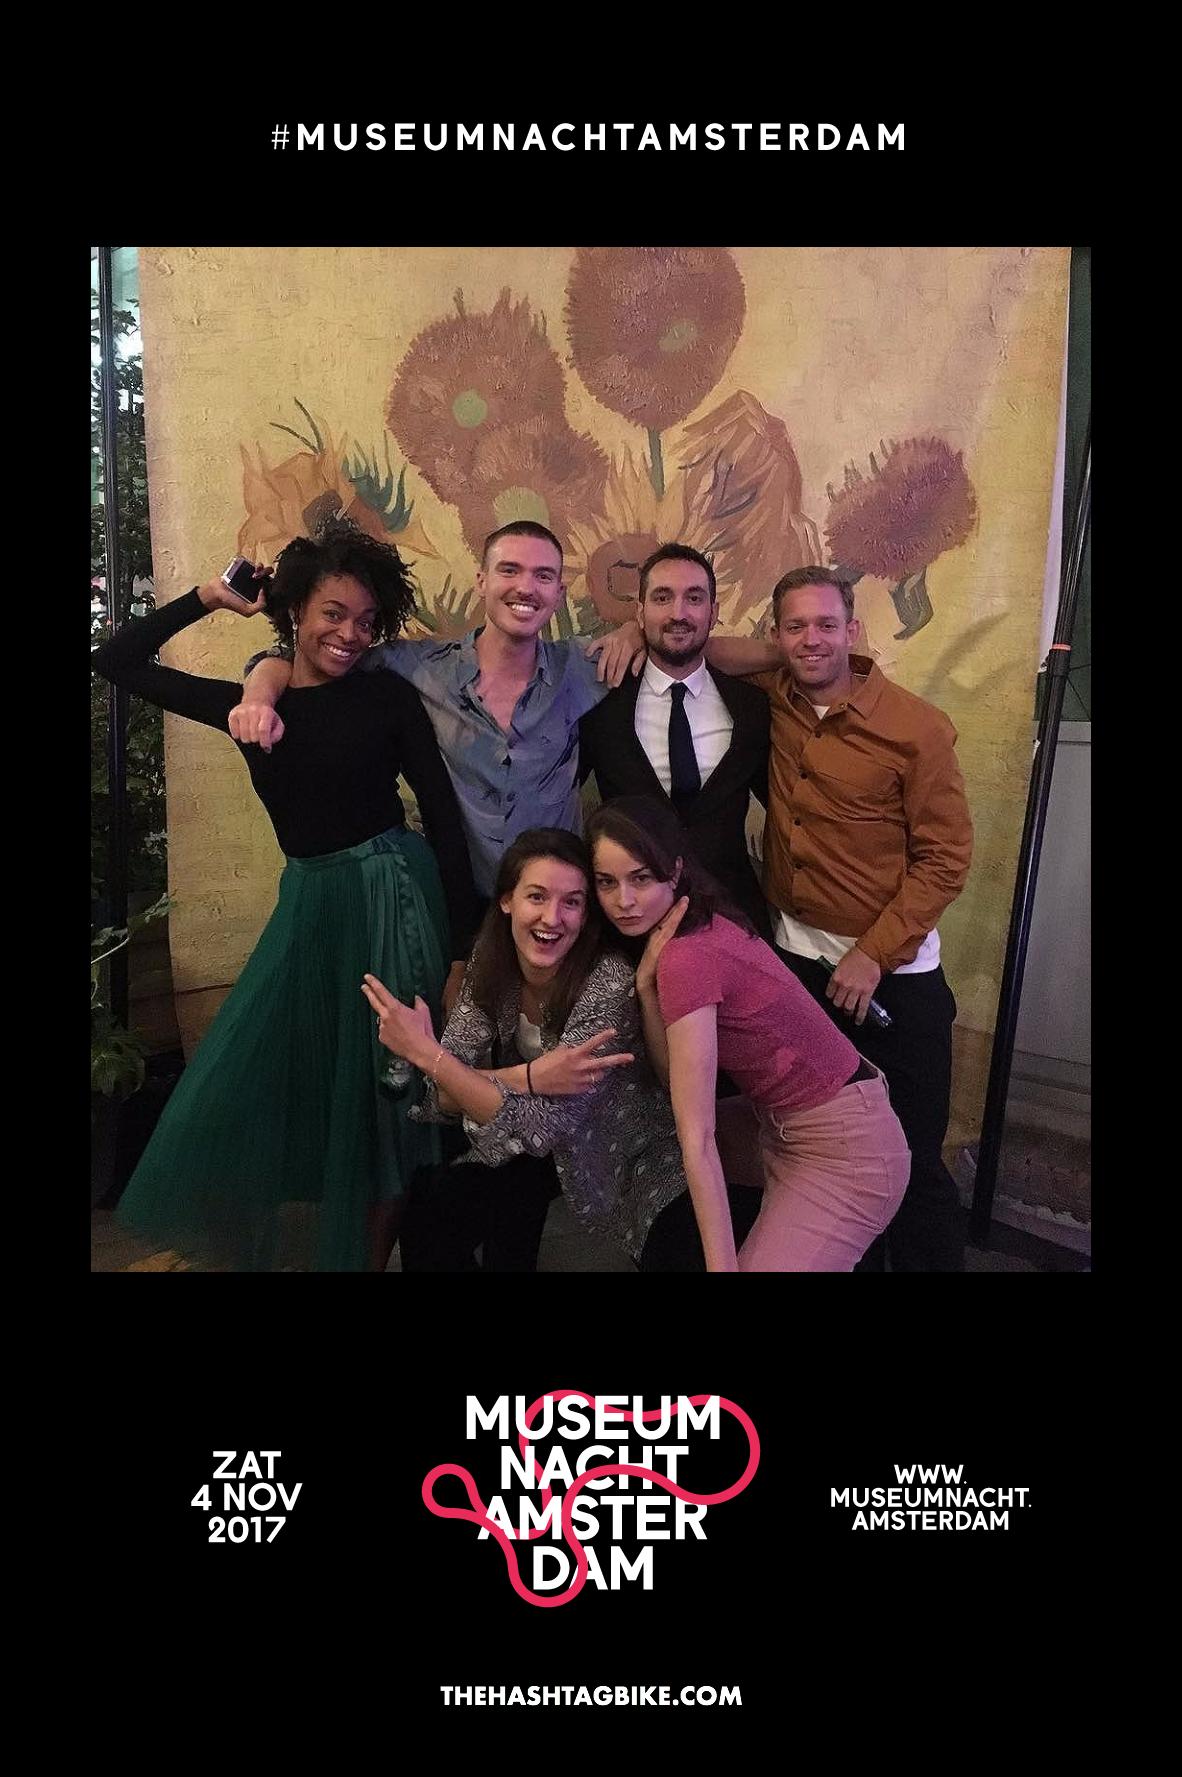 museumnacht_thehashtagbike13.png